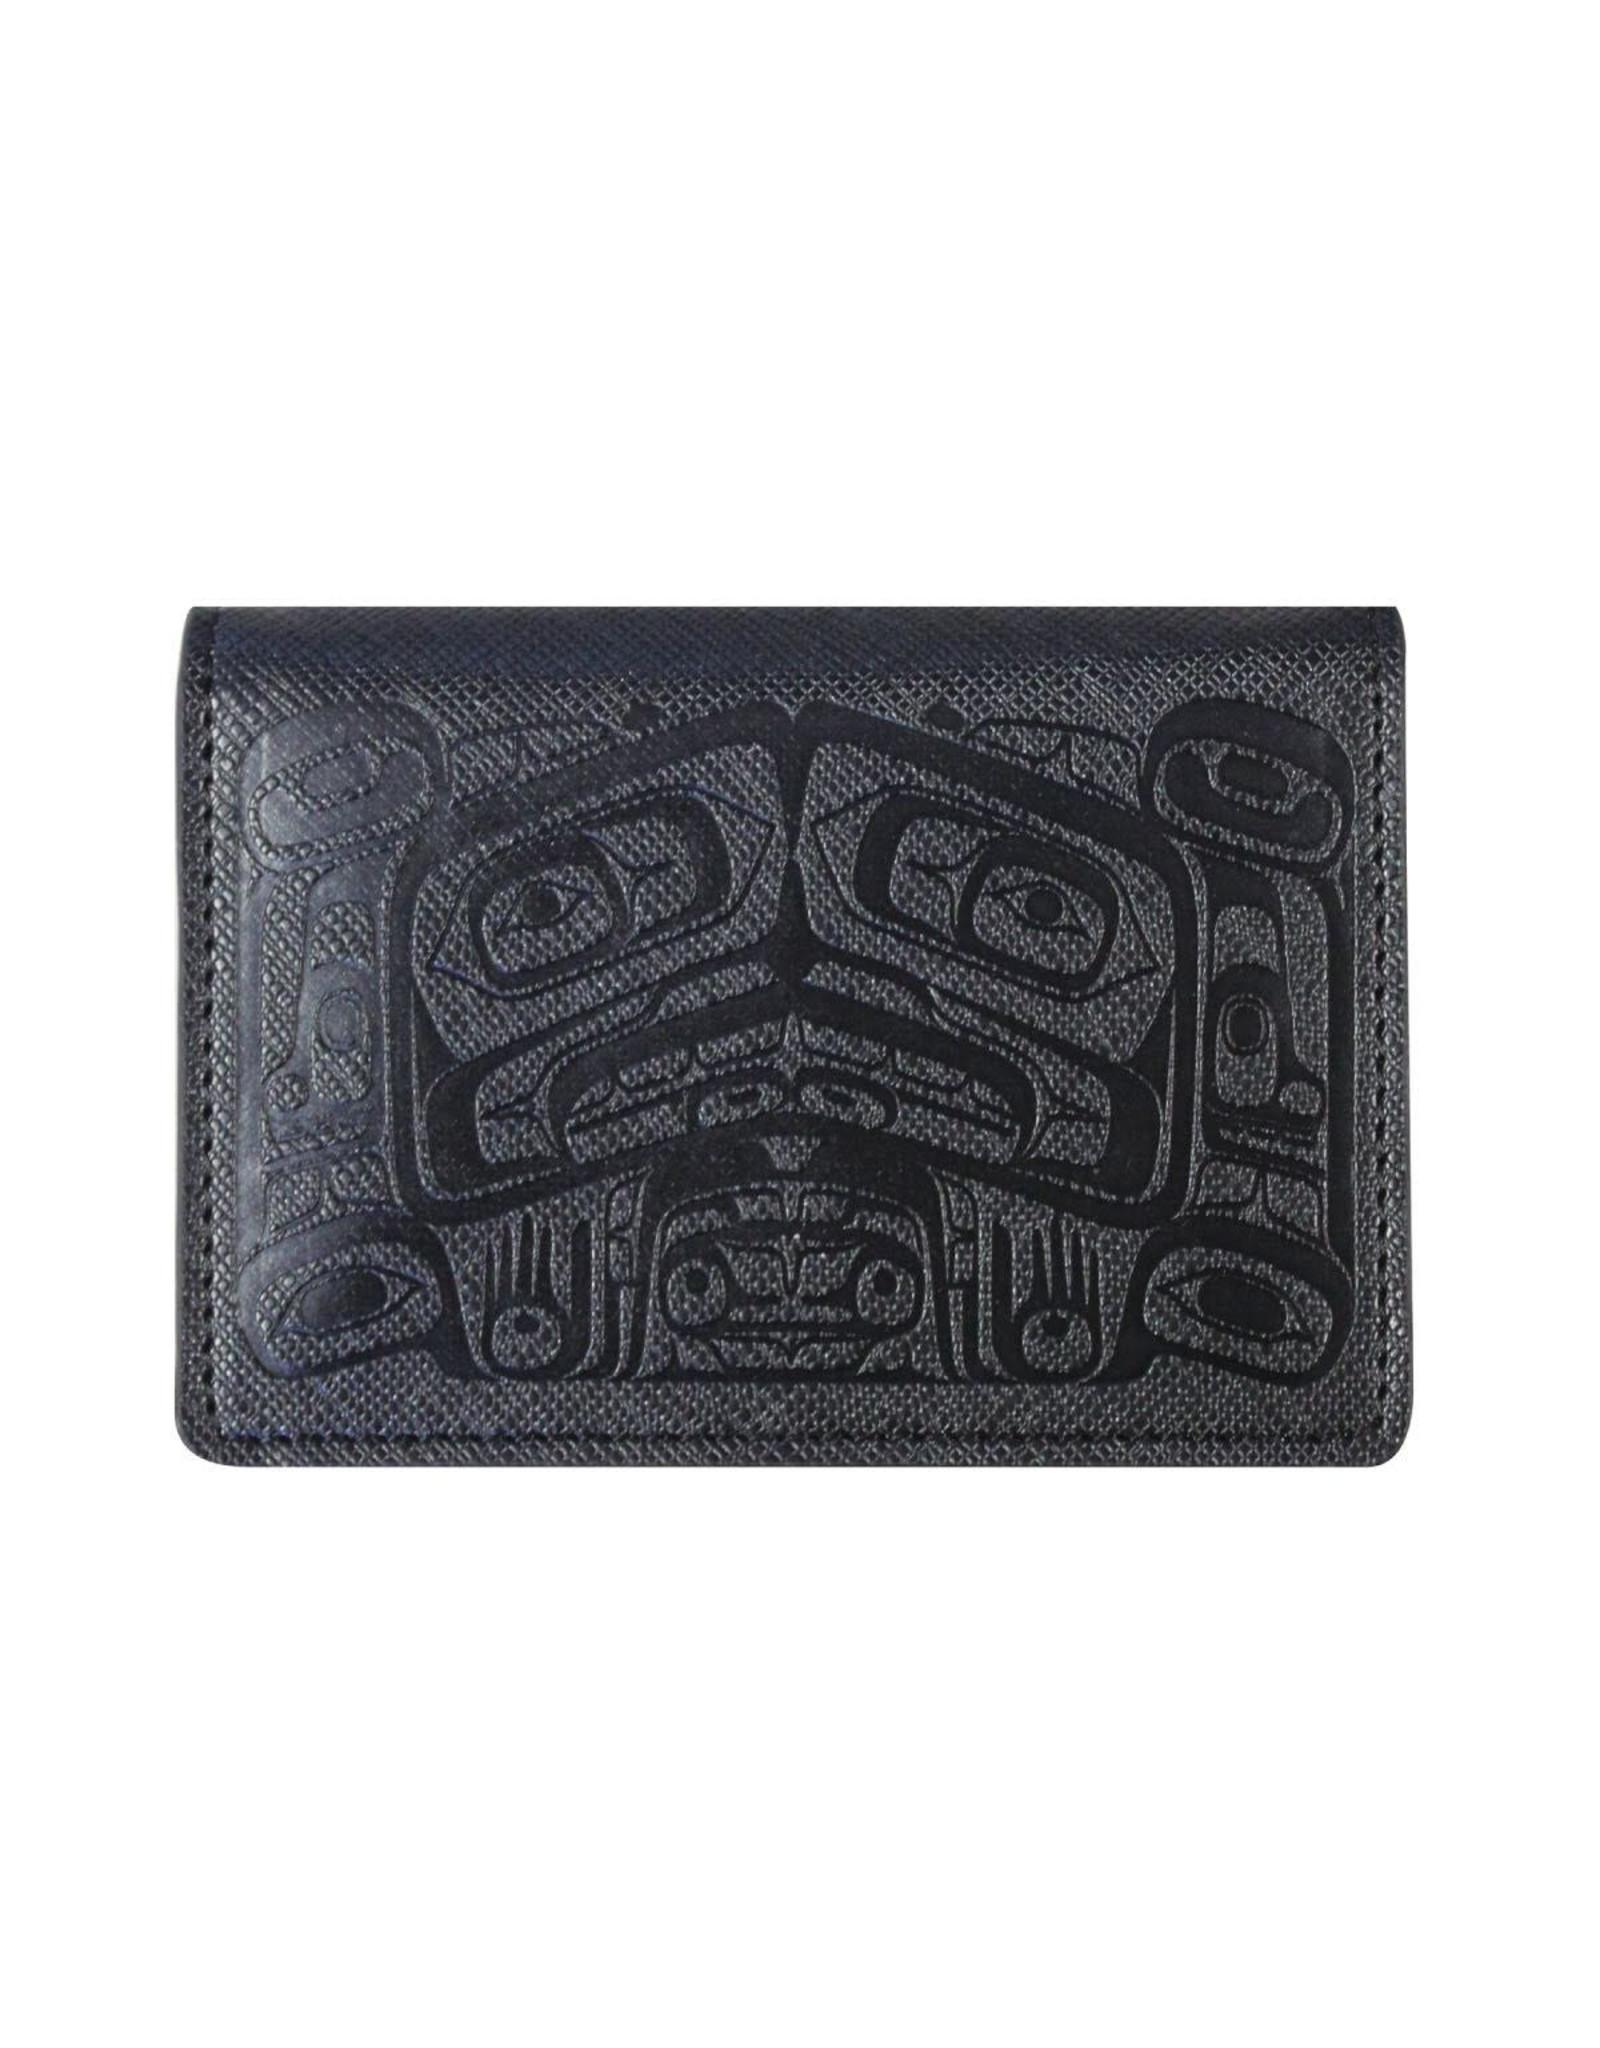 (Black) Raven Box by Allan Weir Card Wallet- ID21